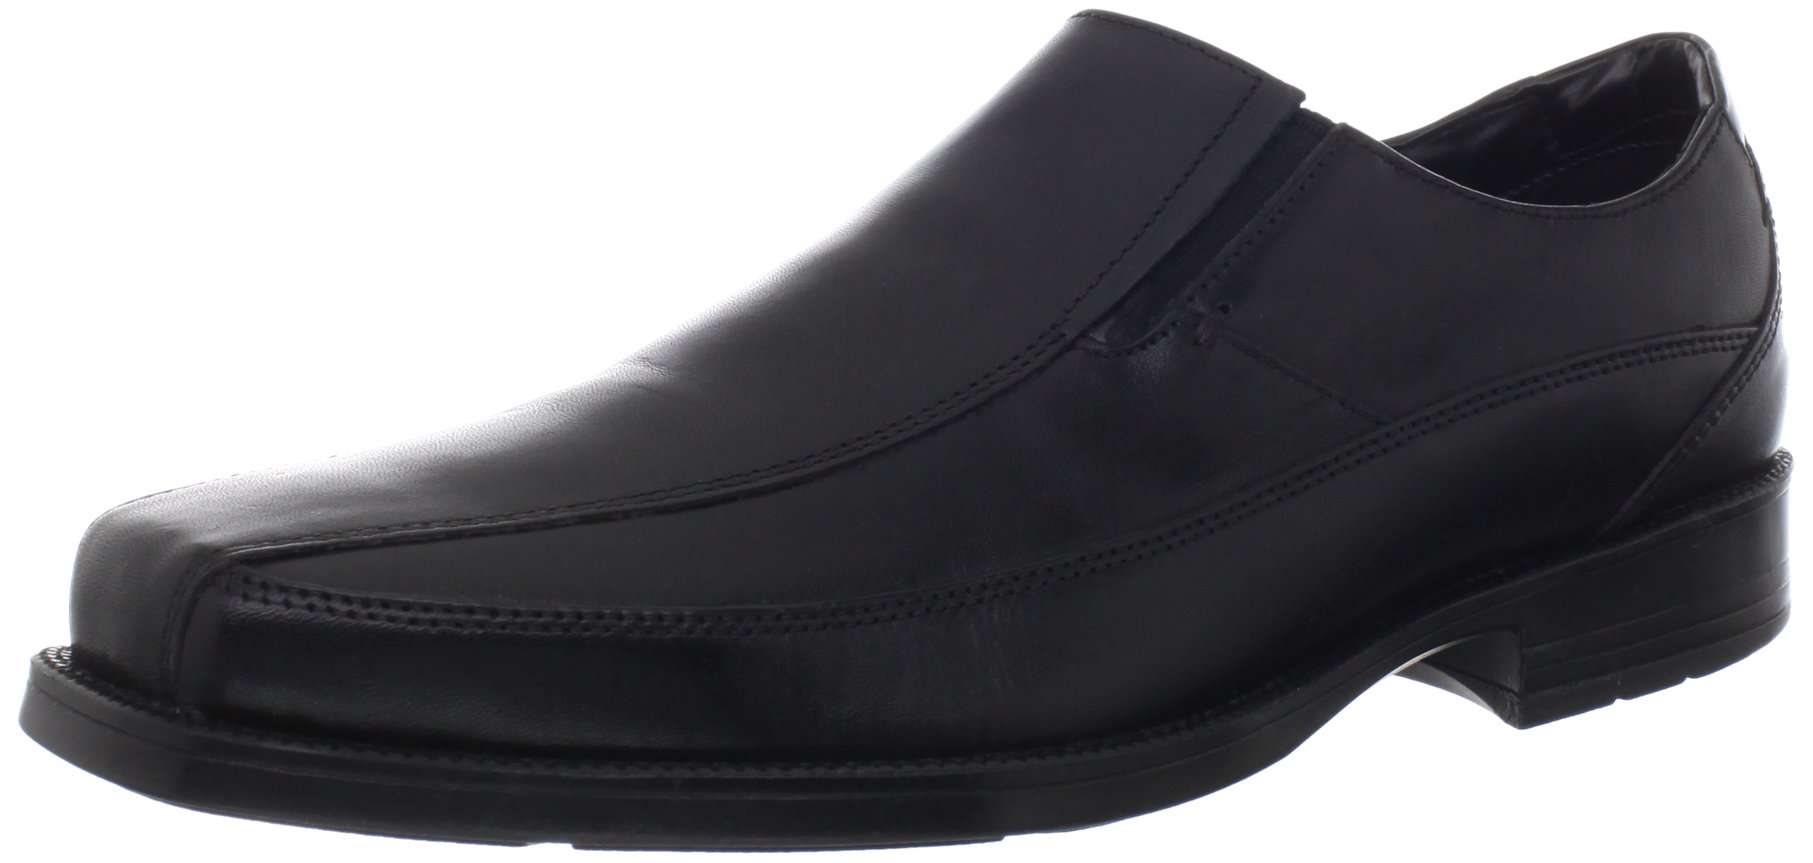 Rockport Men's Ready For Business Slip-On,Black,10 M US by Rockport